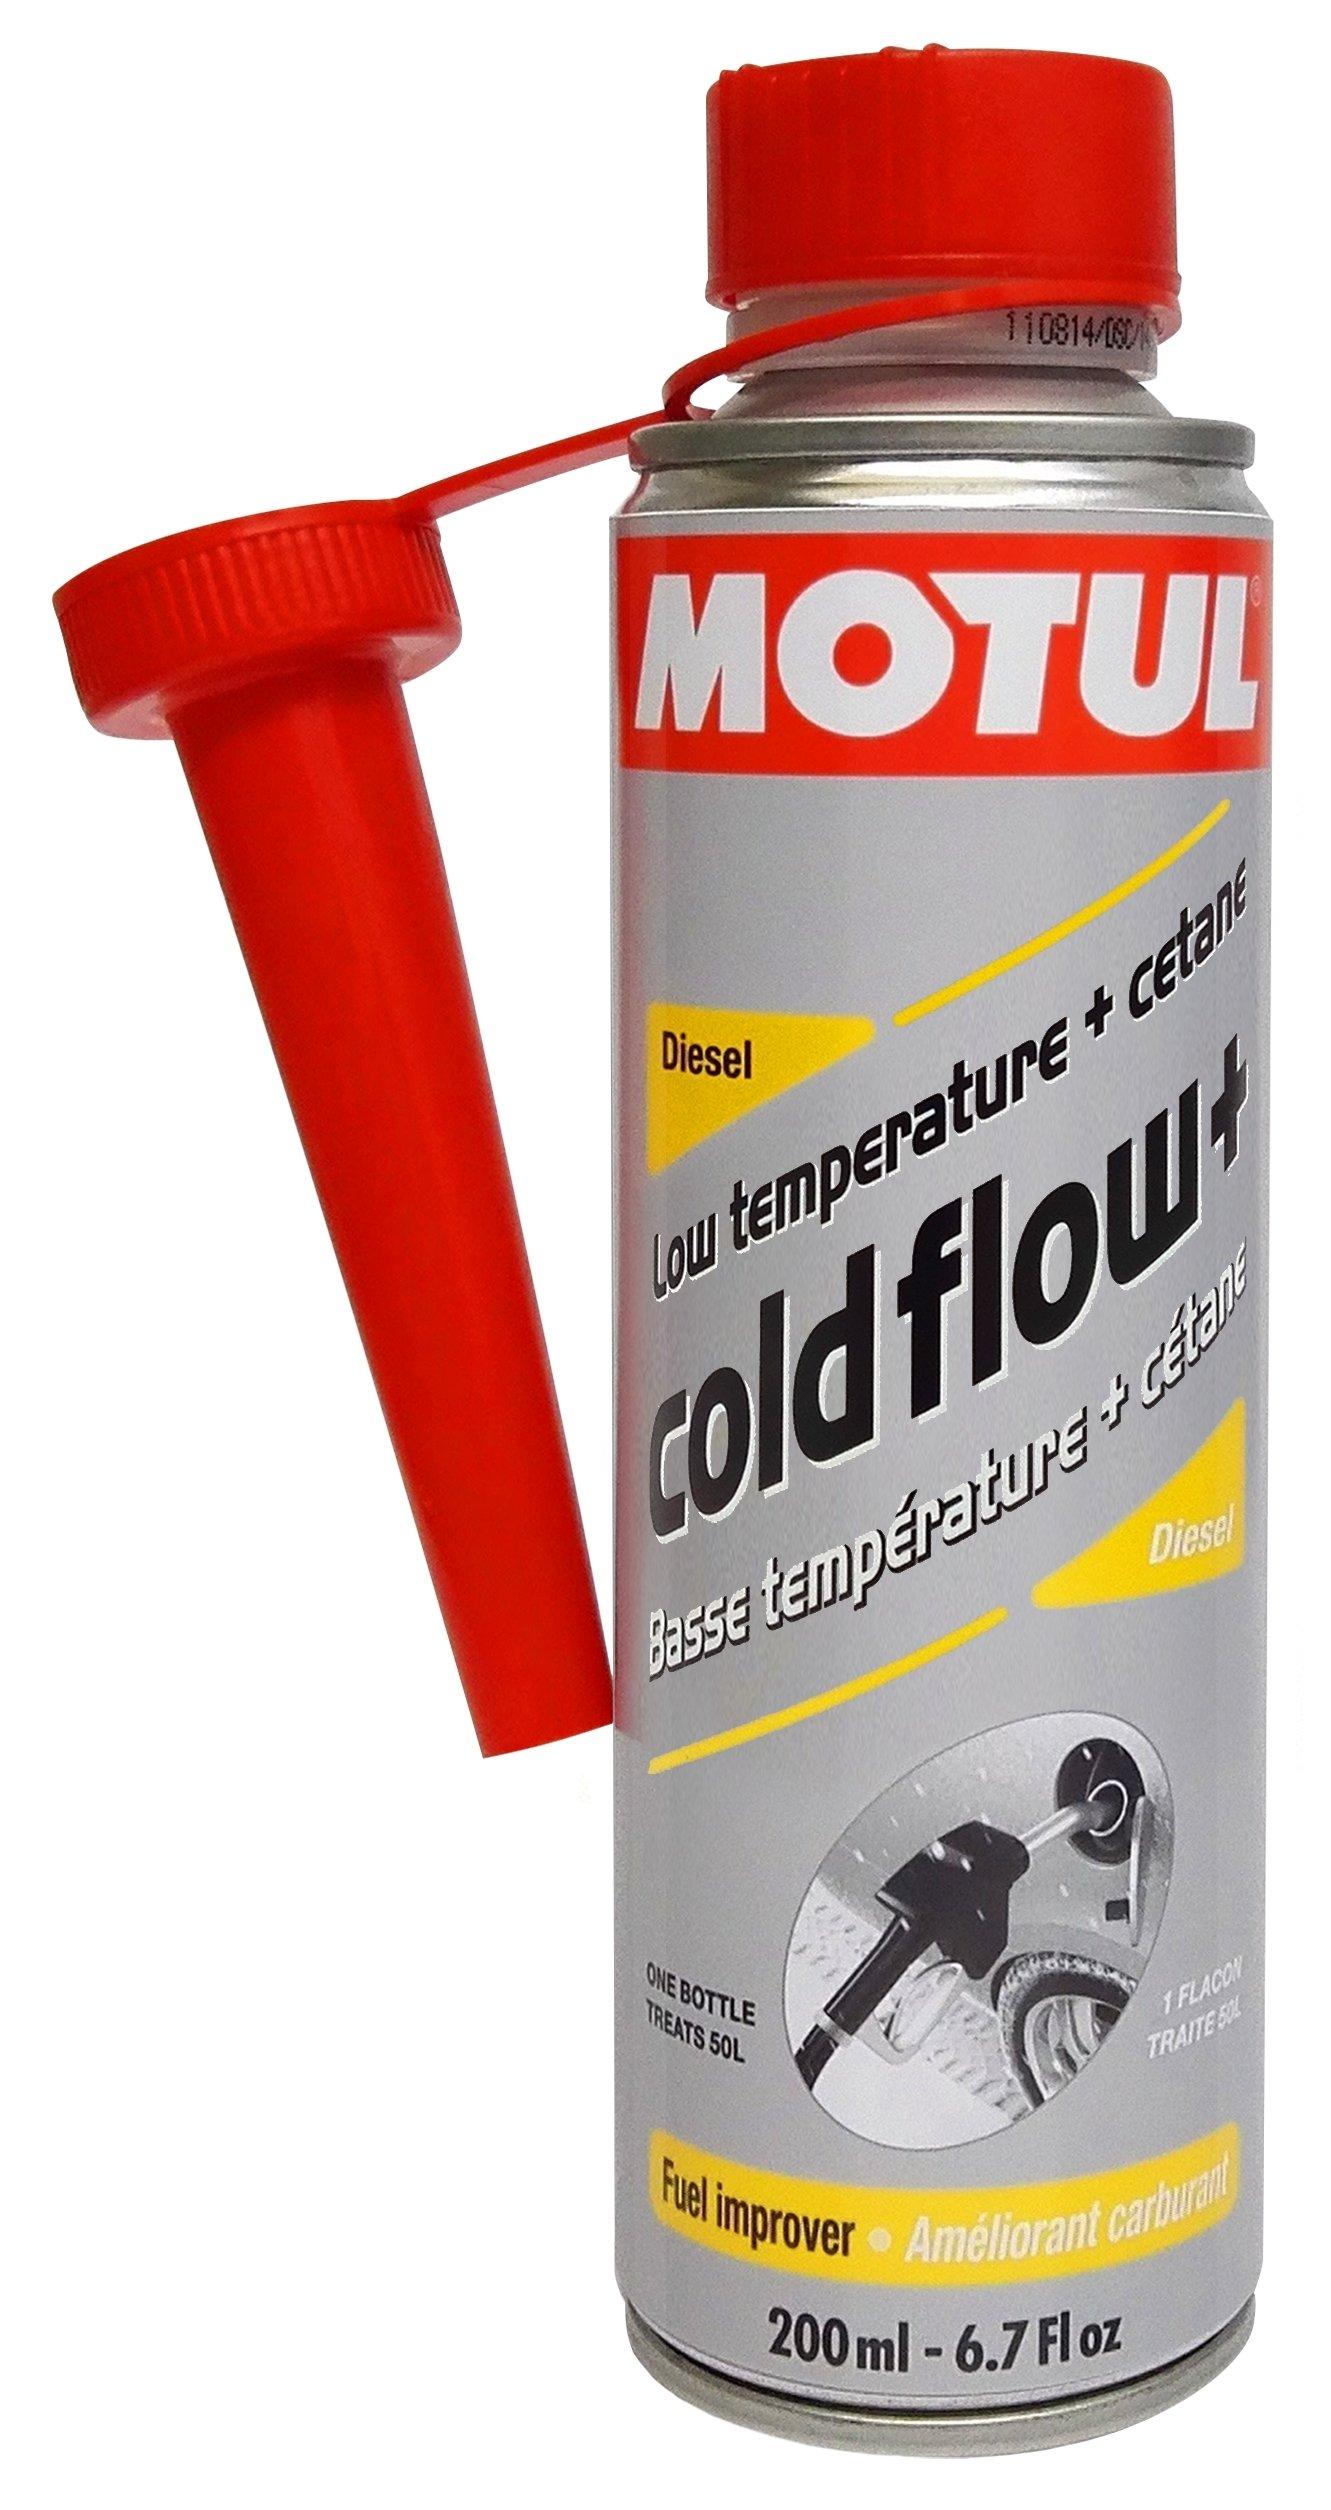 Motul COLD FLOW + DIESEL 200 мл